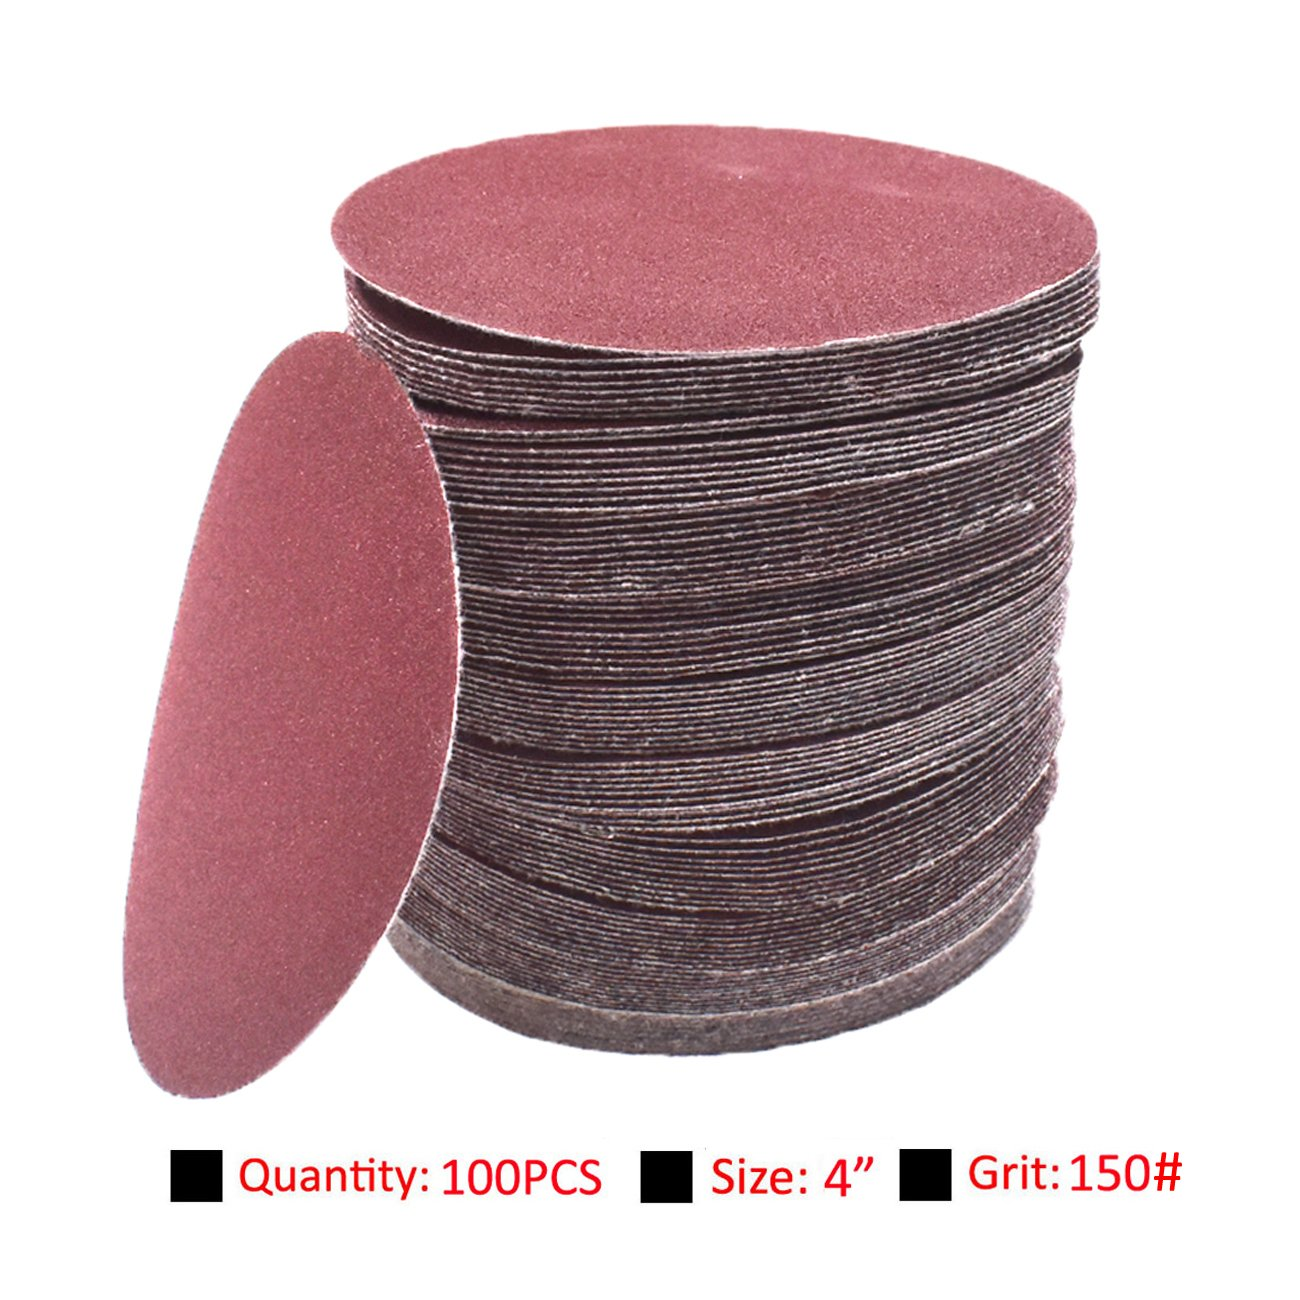 NAVARME 100pcs 100mm 4 Inch Sanding Disc 150 Grit Orbital Sander Pads Abrasive Sandpaper